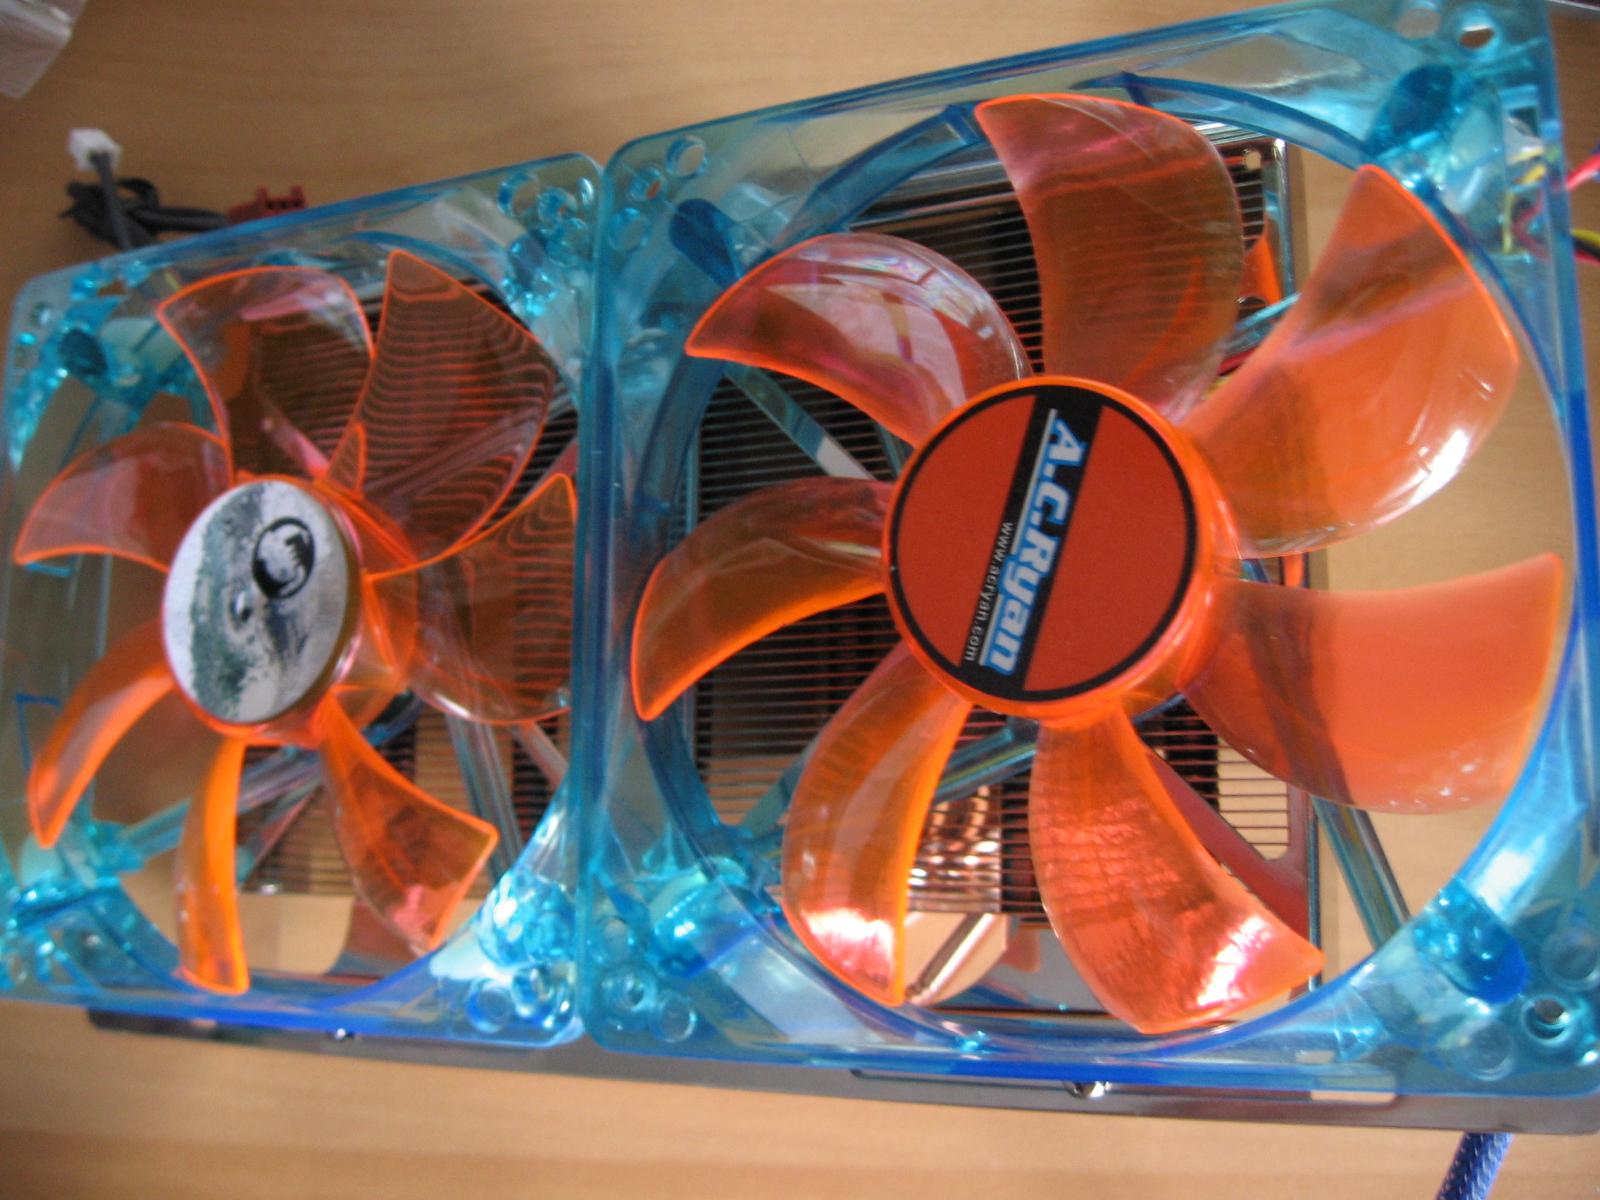 http://phothorizons.free.fr/GeminII%20045.jpg